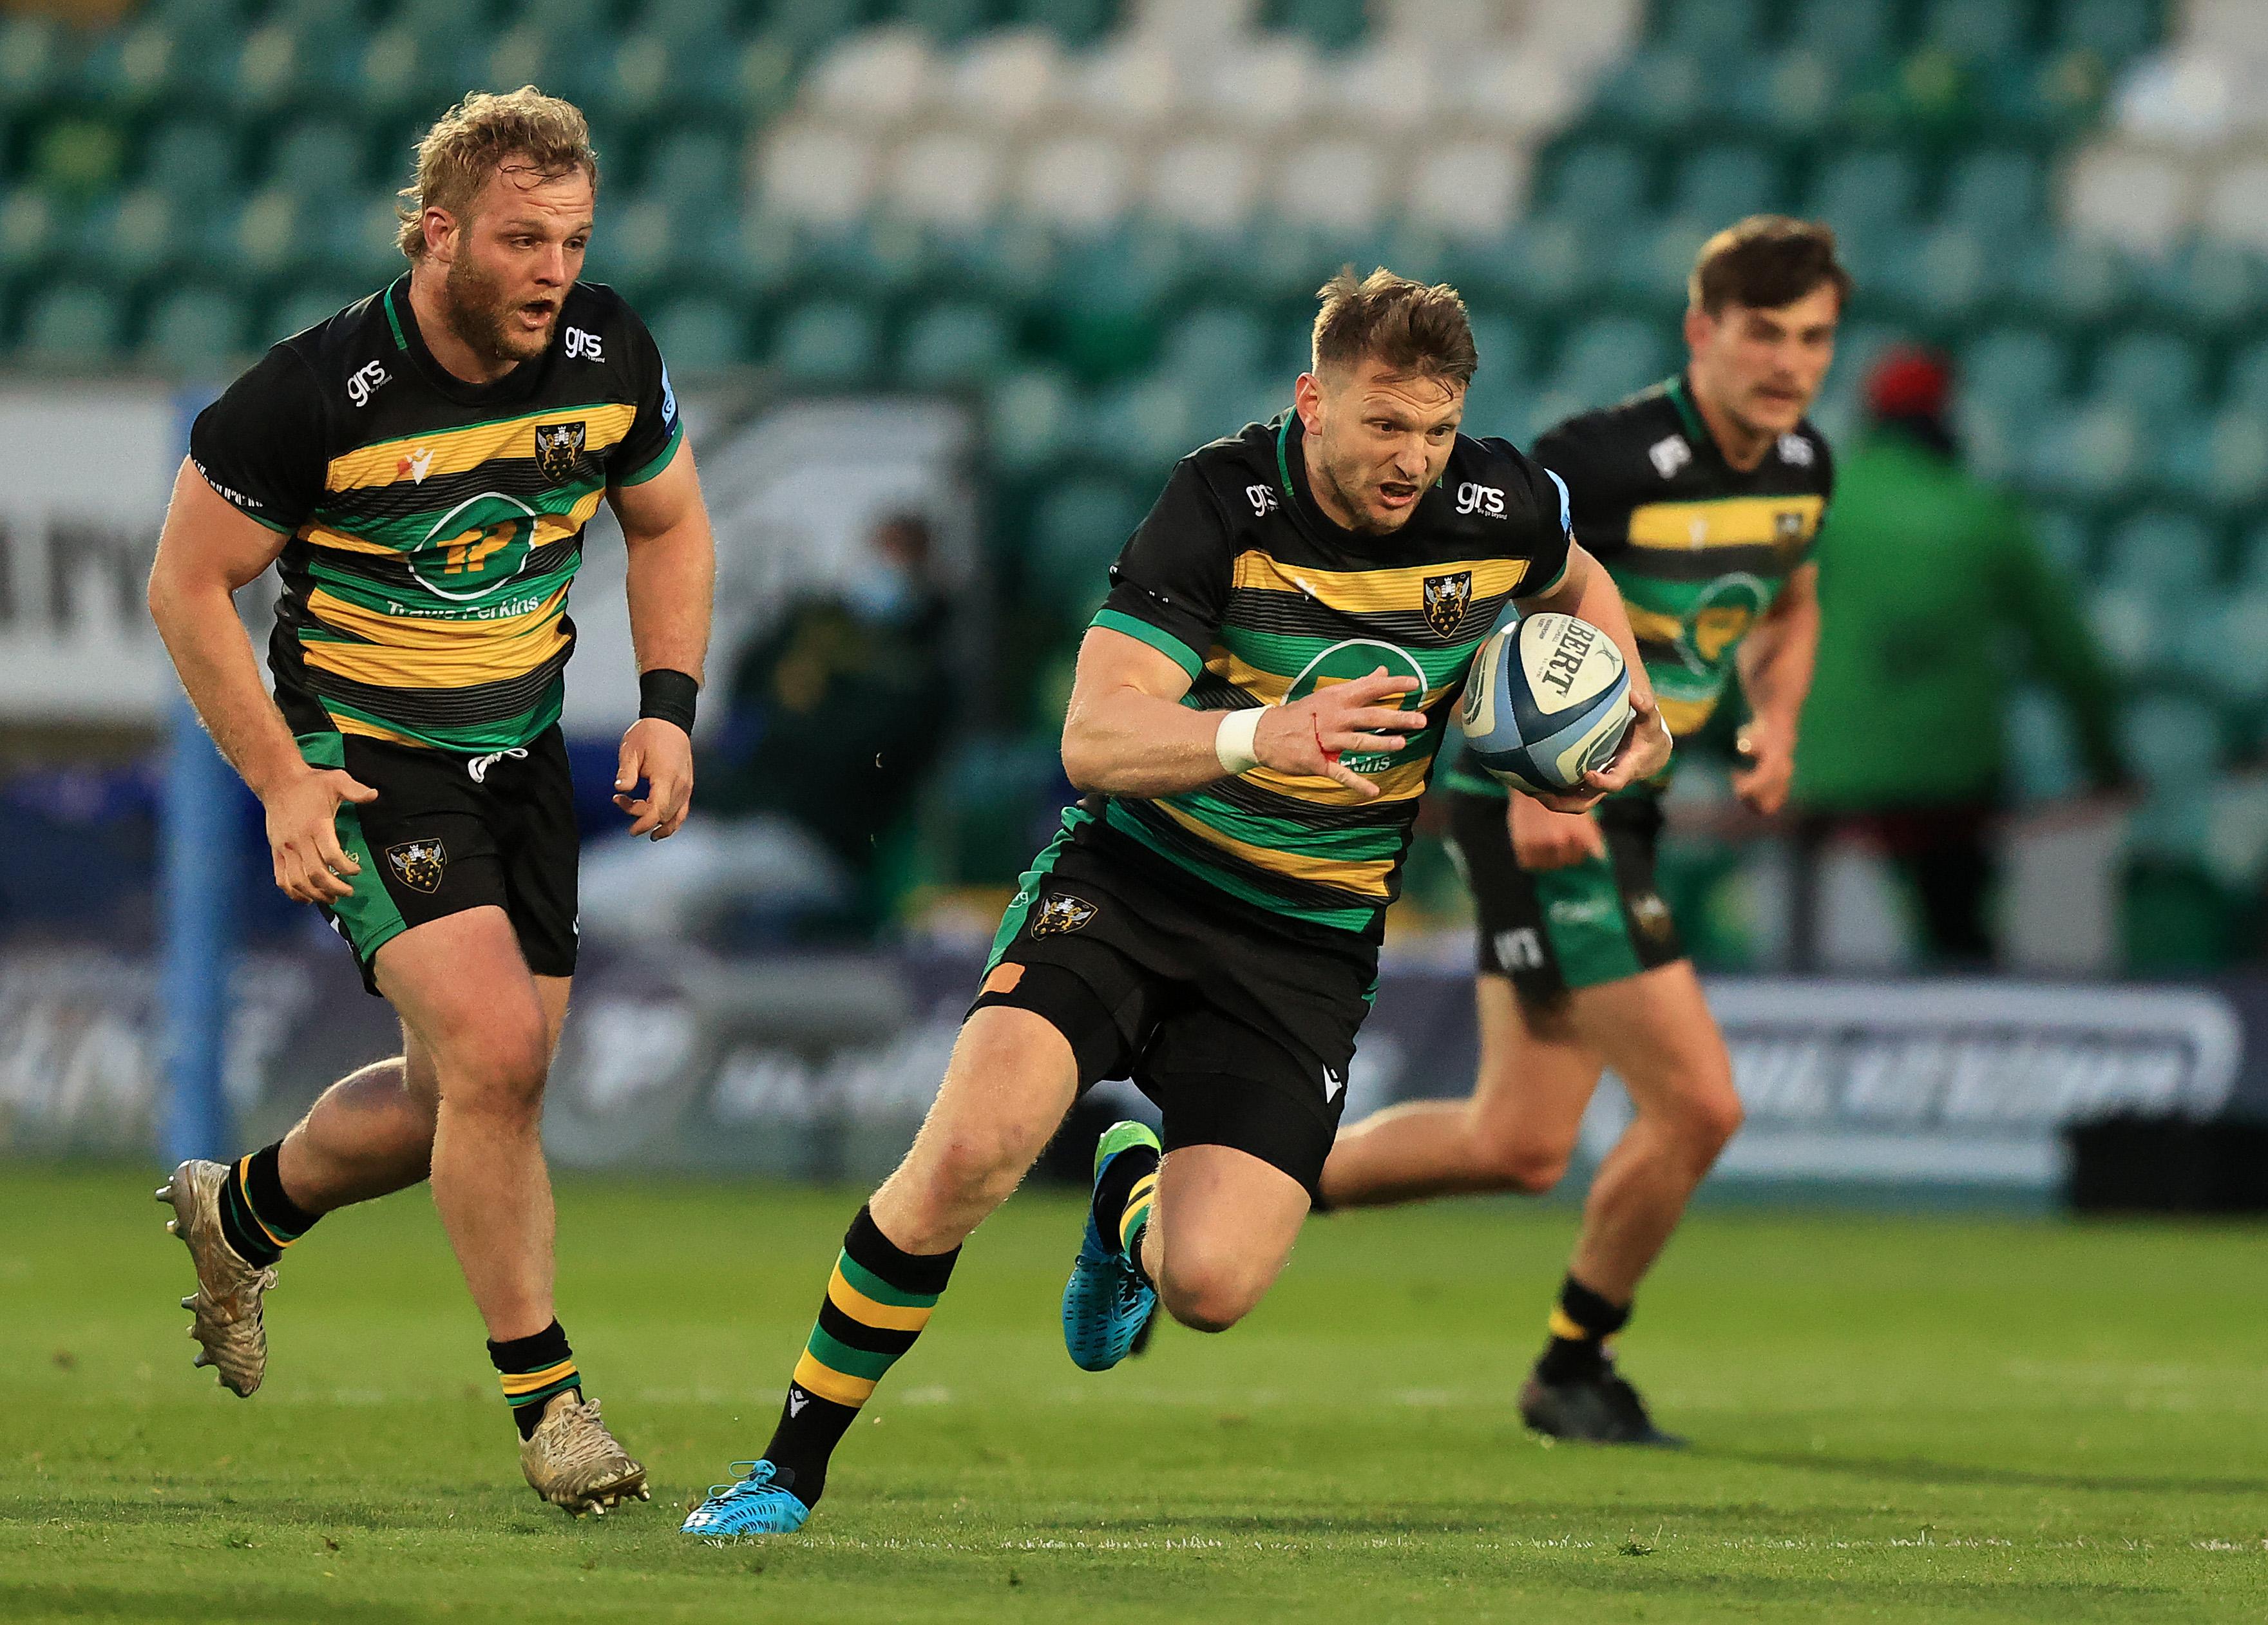 Northampton Saints v London Irish - Gallagher Premiership Rugby